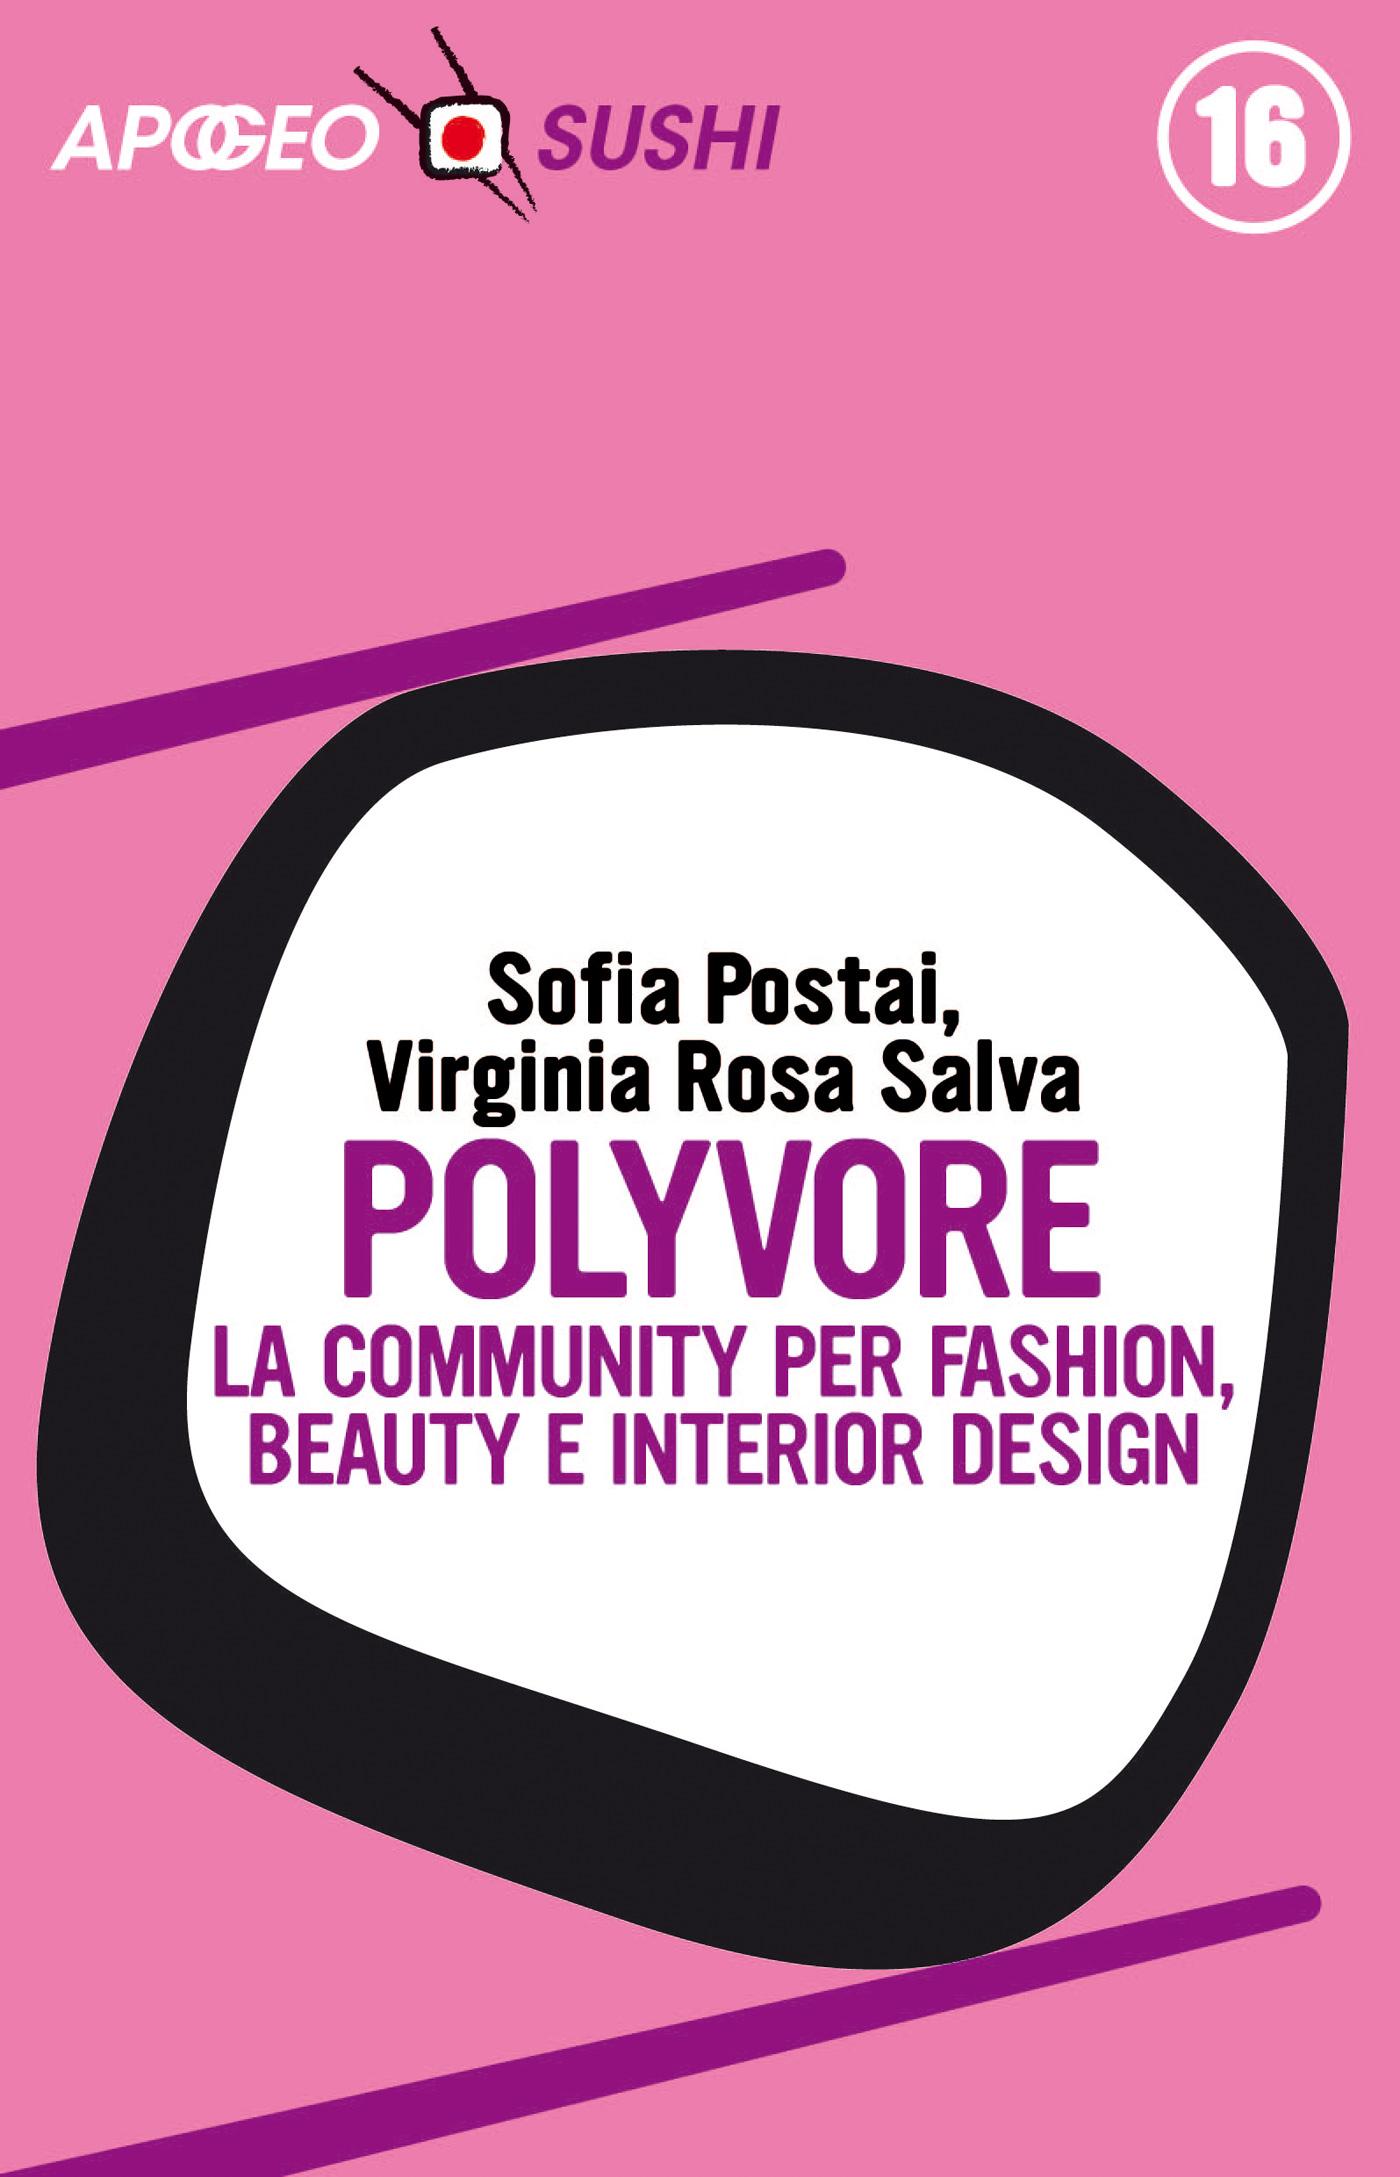 Polyvore – Sofia Postai, Virginia Rosa Salva